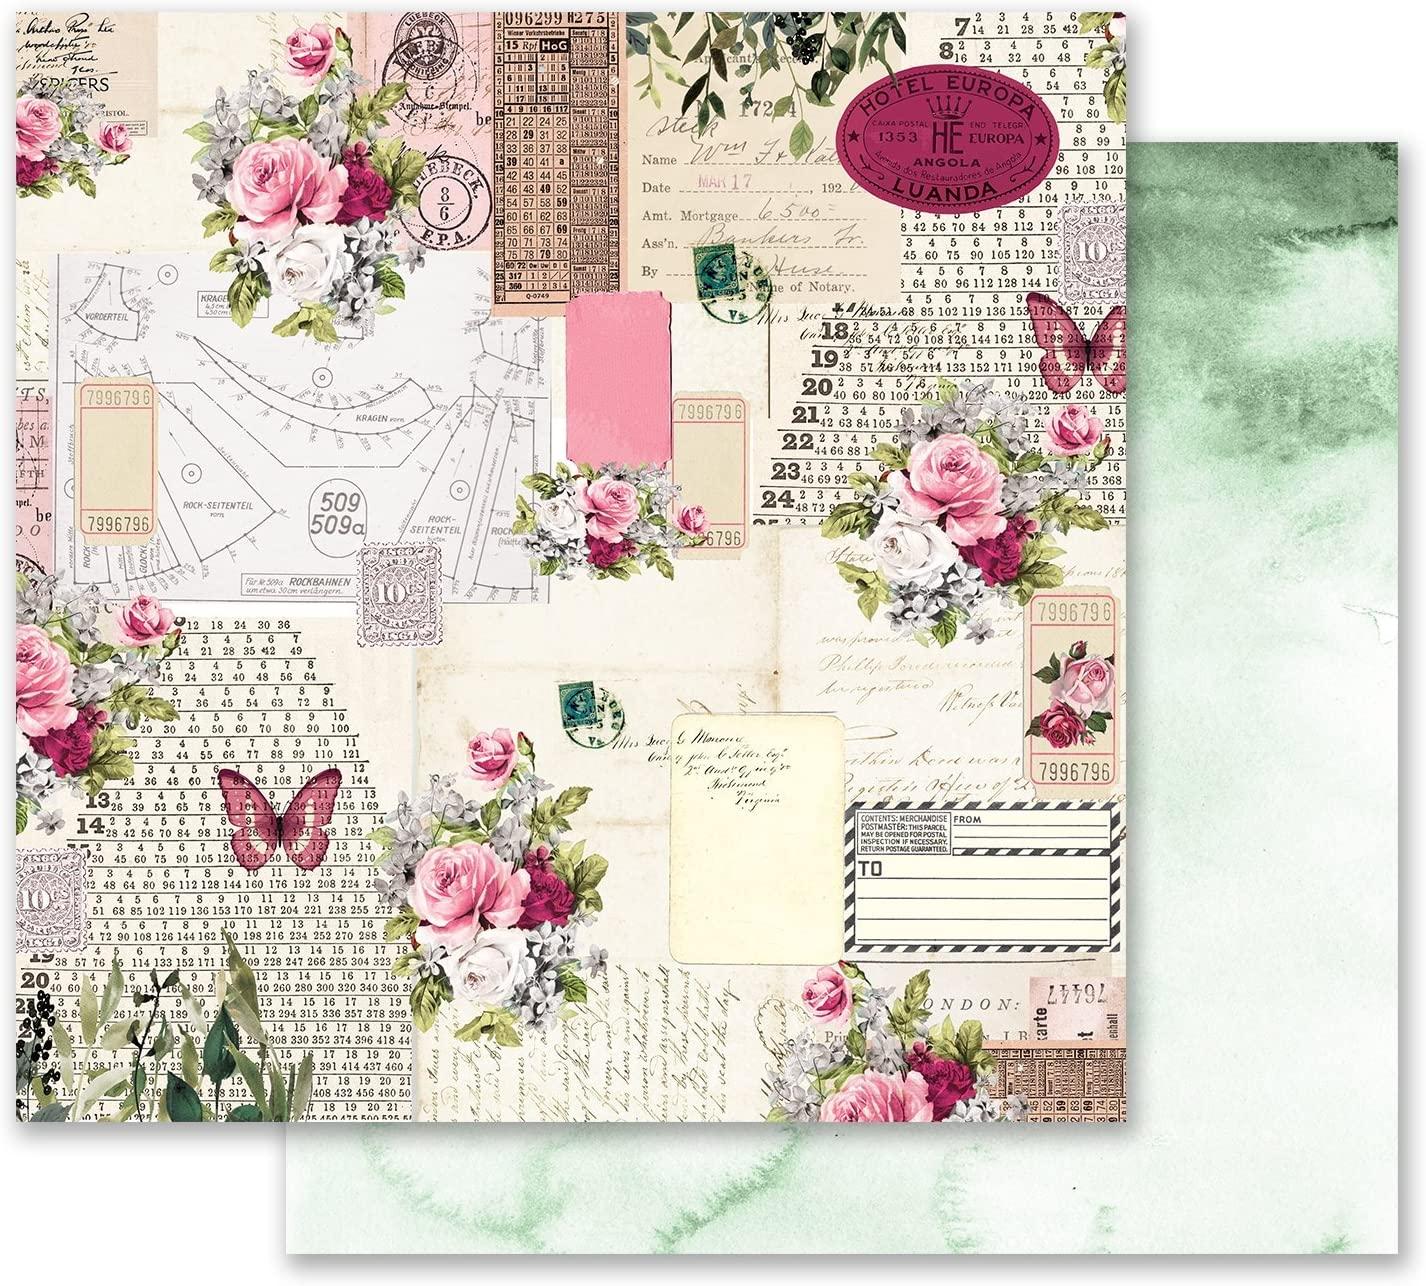 Prima Marketing Inc. Misty Rose 12x12 Paper-Scented Love Letters, 12 x 12, Multicolor